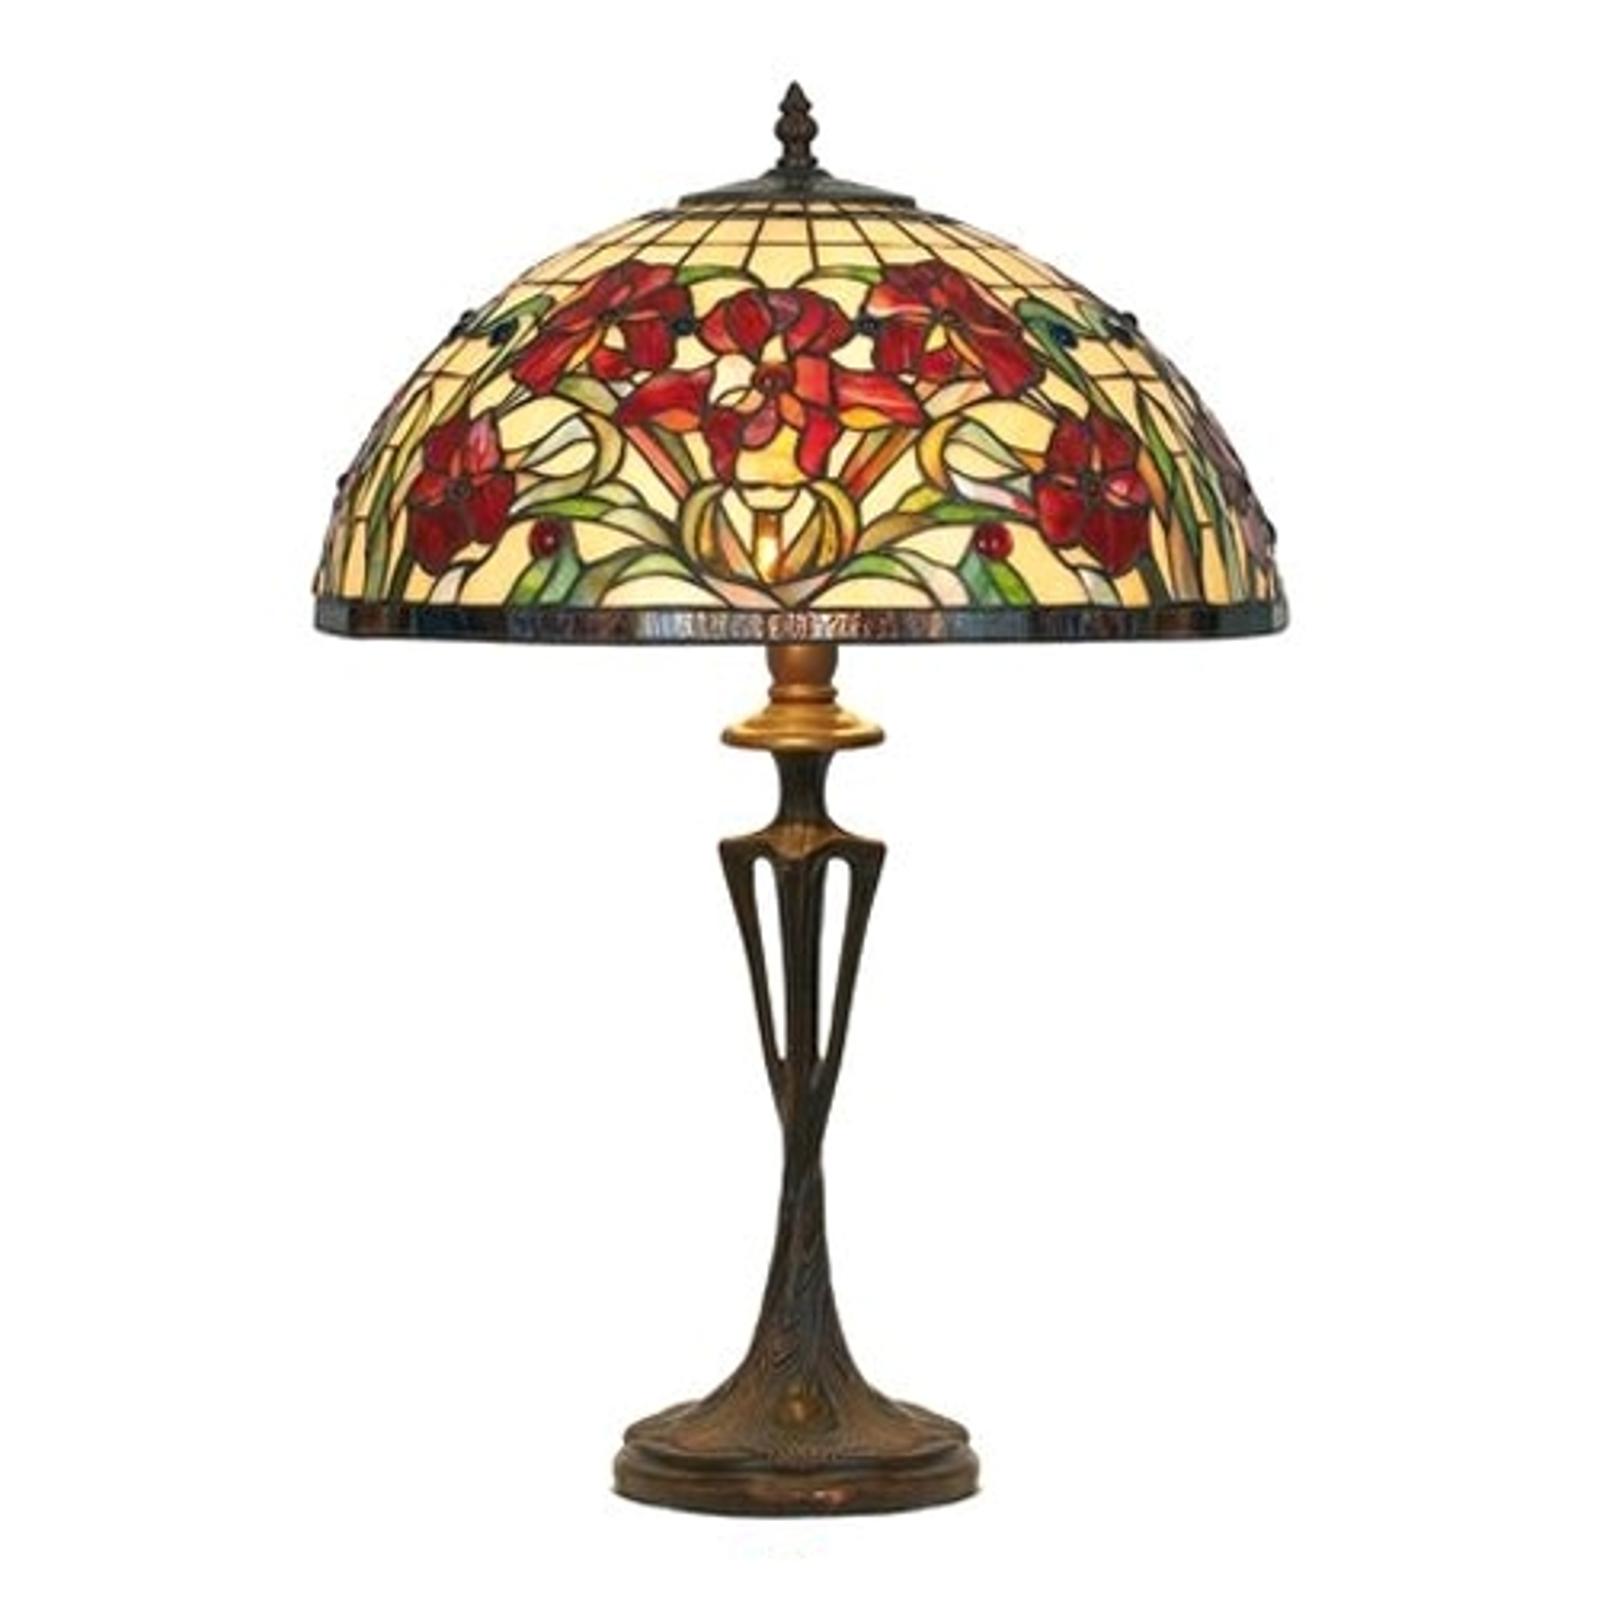 Tafellamp Eline in Tiffany-stijl